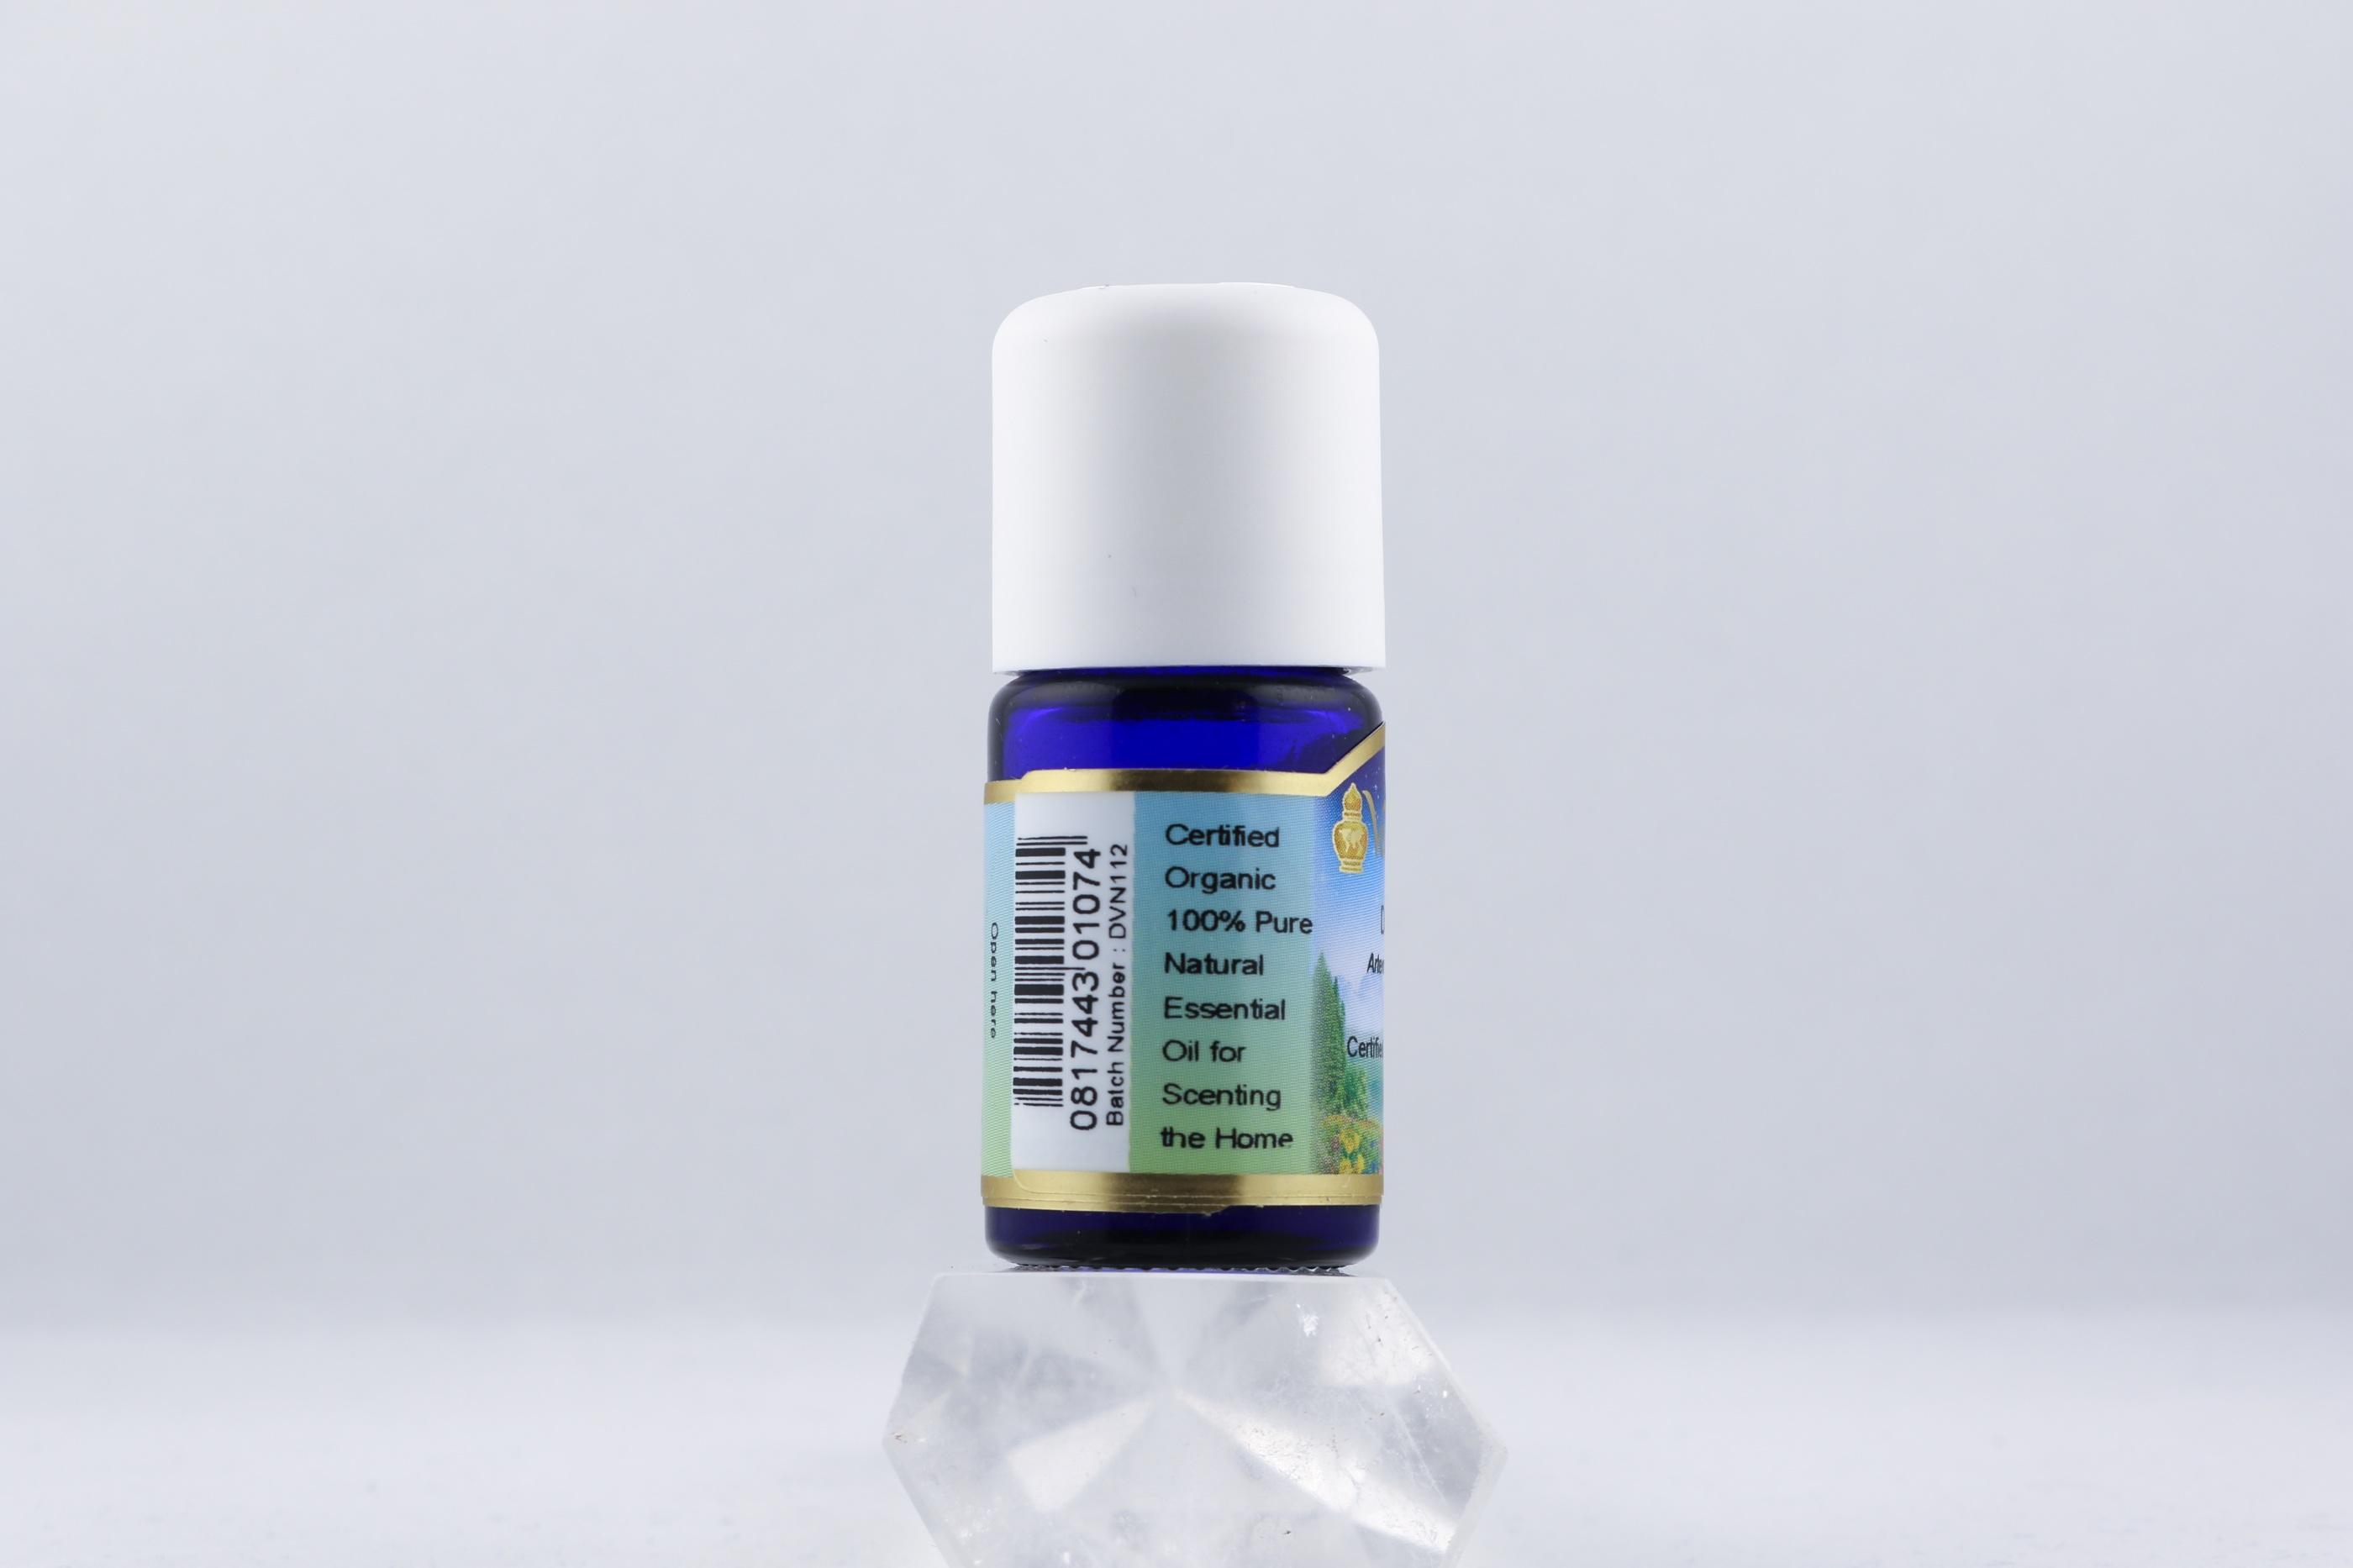 Davana olja wellness ayurveda halmstad sweden svensk eterisk aroma olja